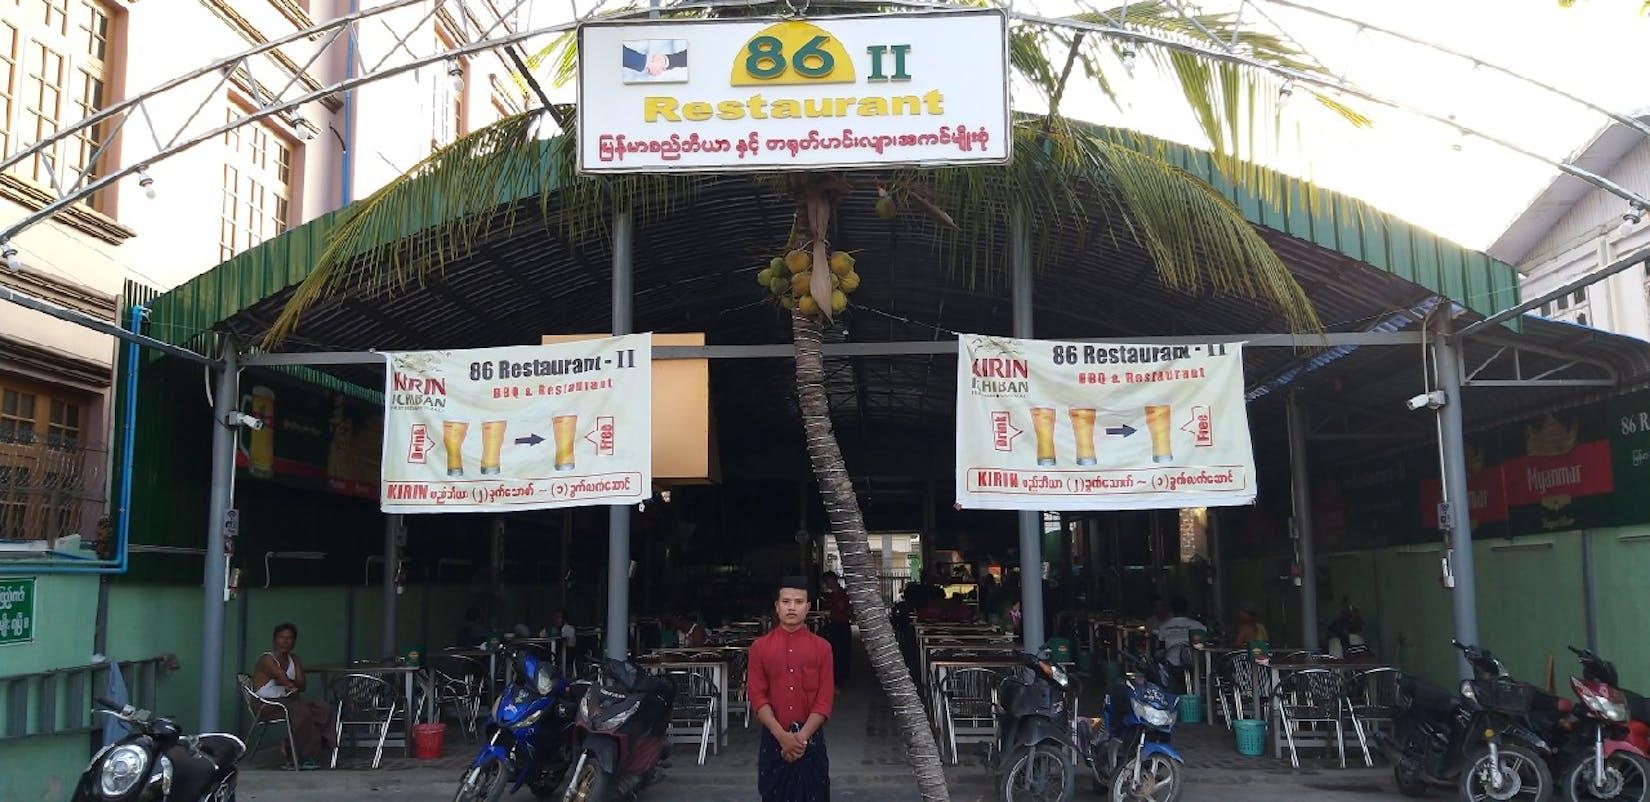 86 Restaurant-II | yathar